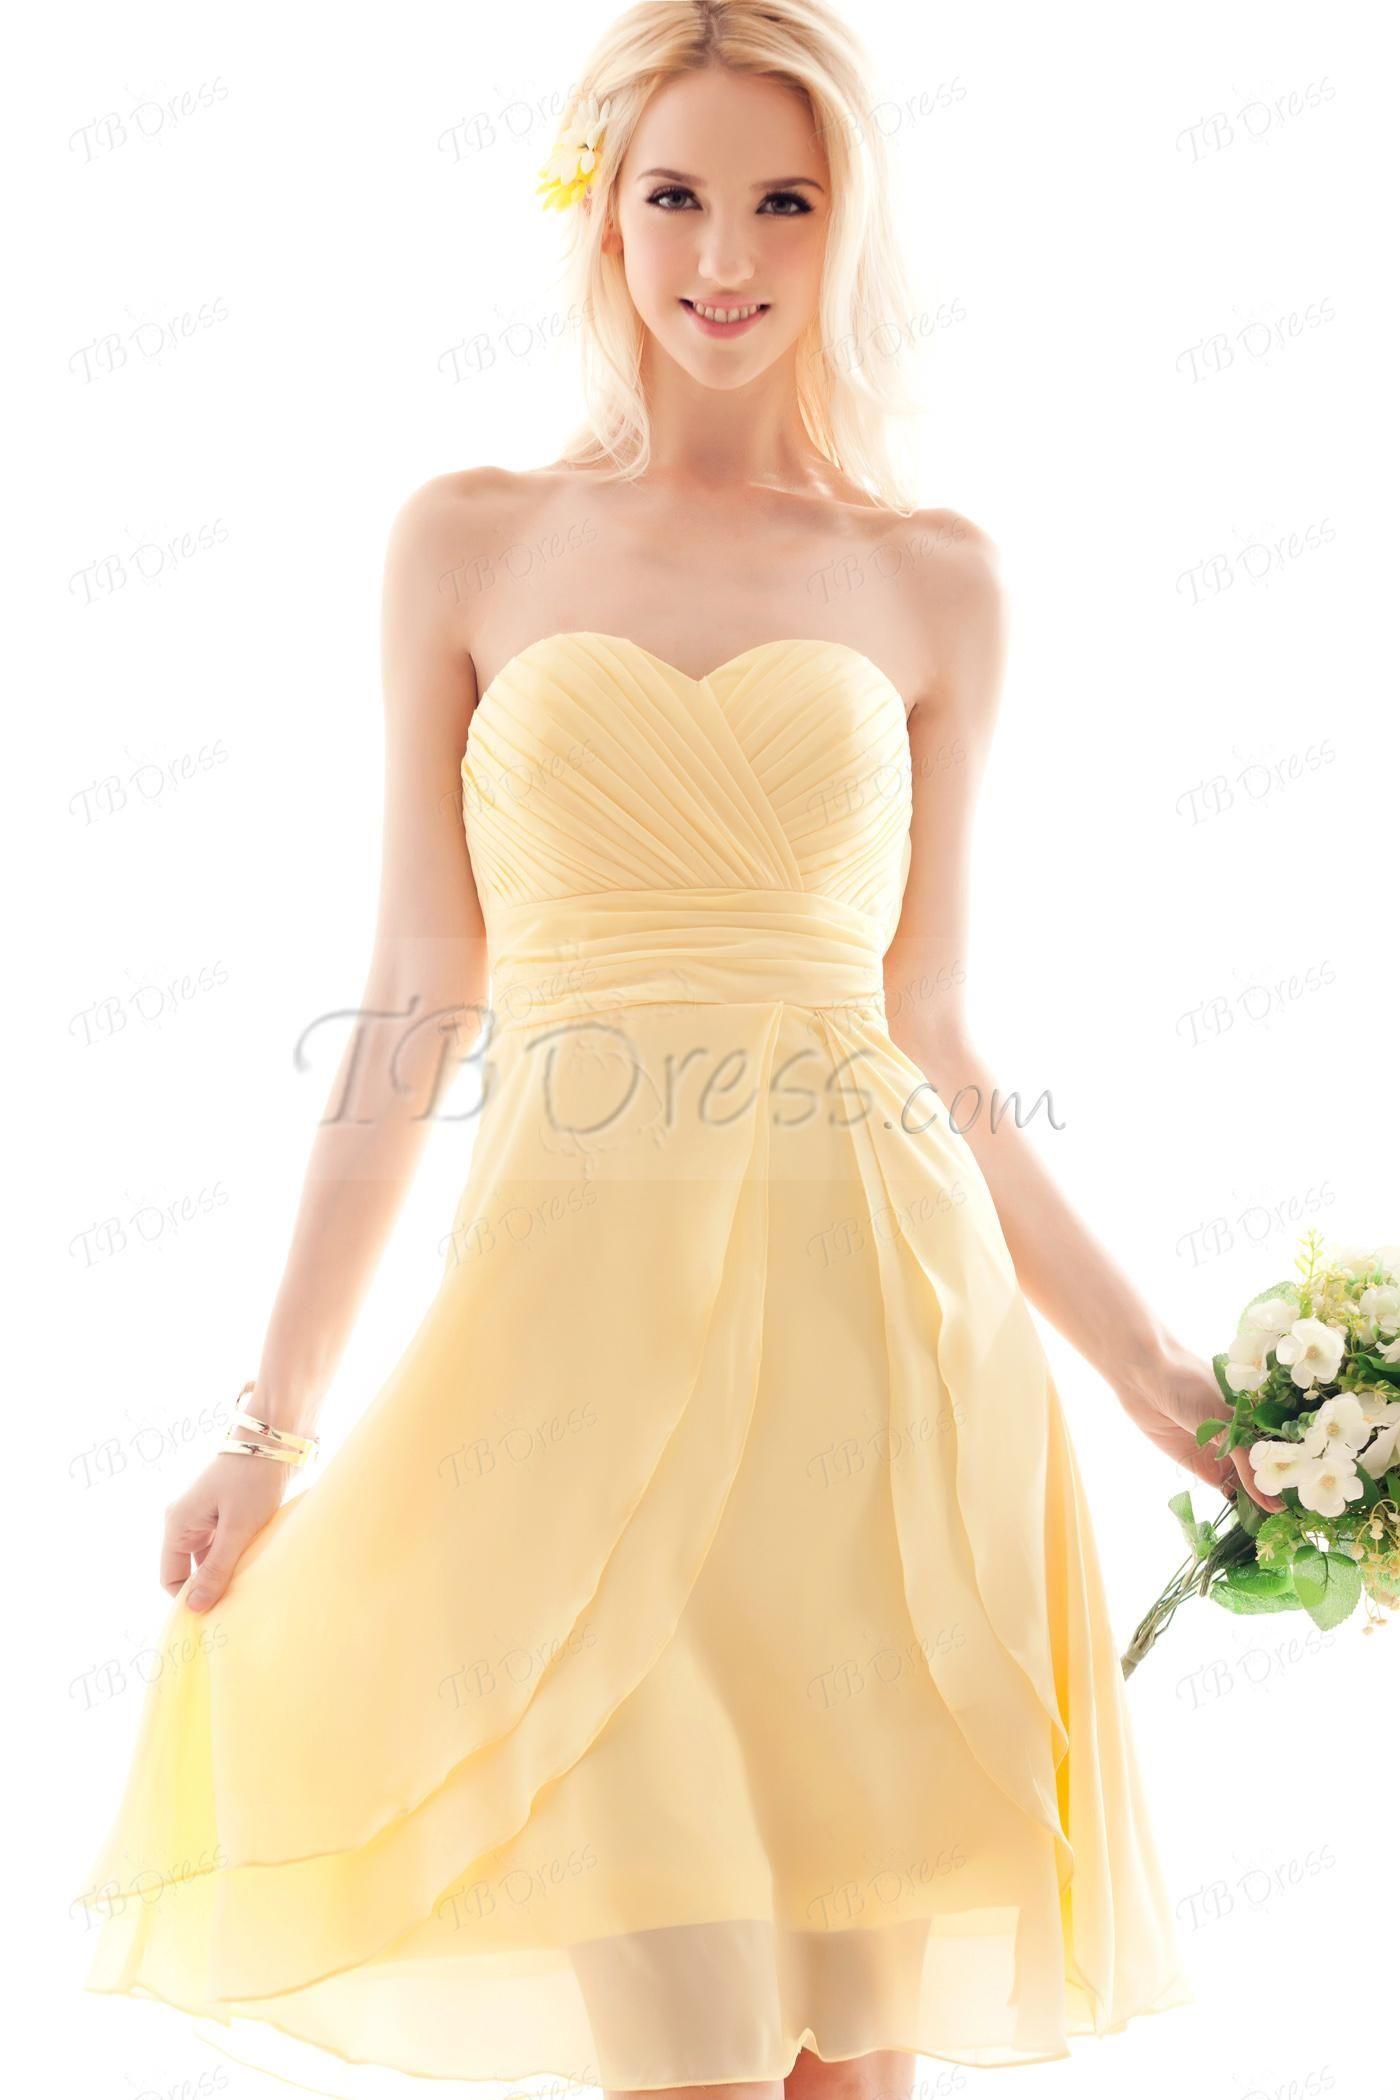 Pastel yellow bridesmaid dresses bridemaid dress pinterest